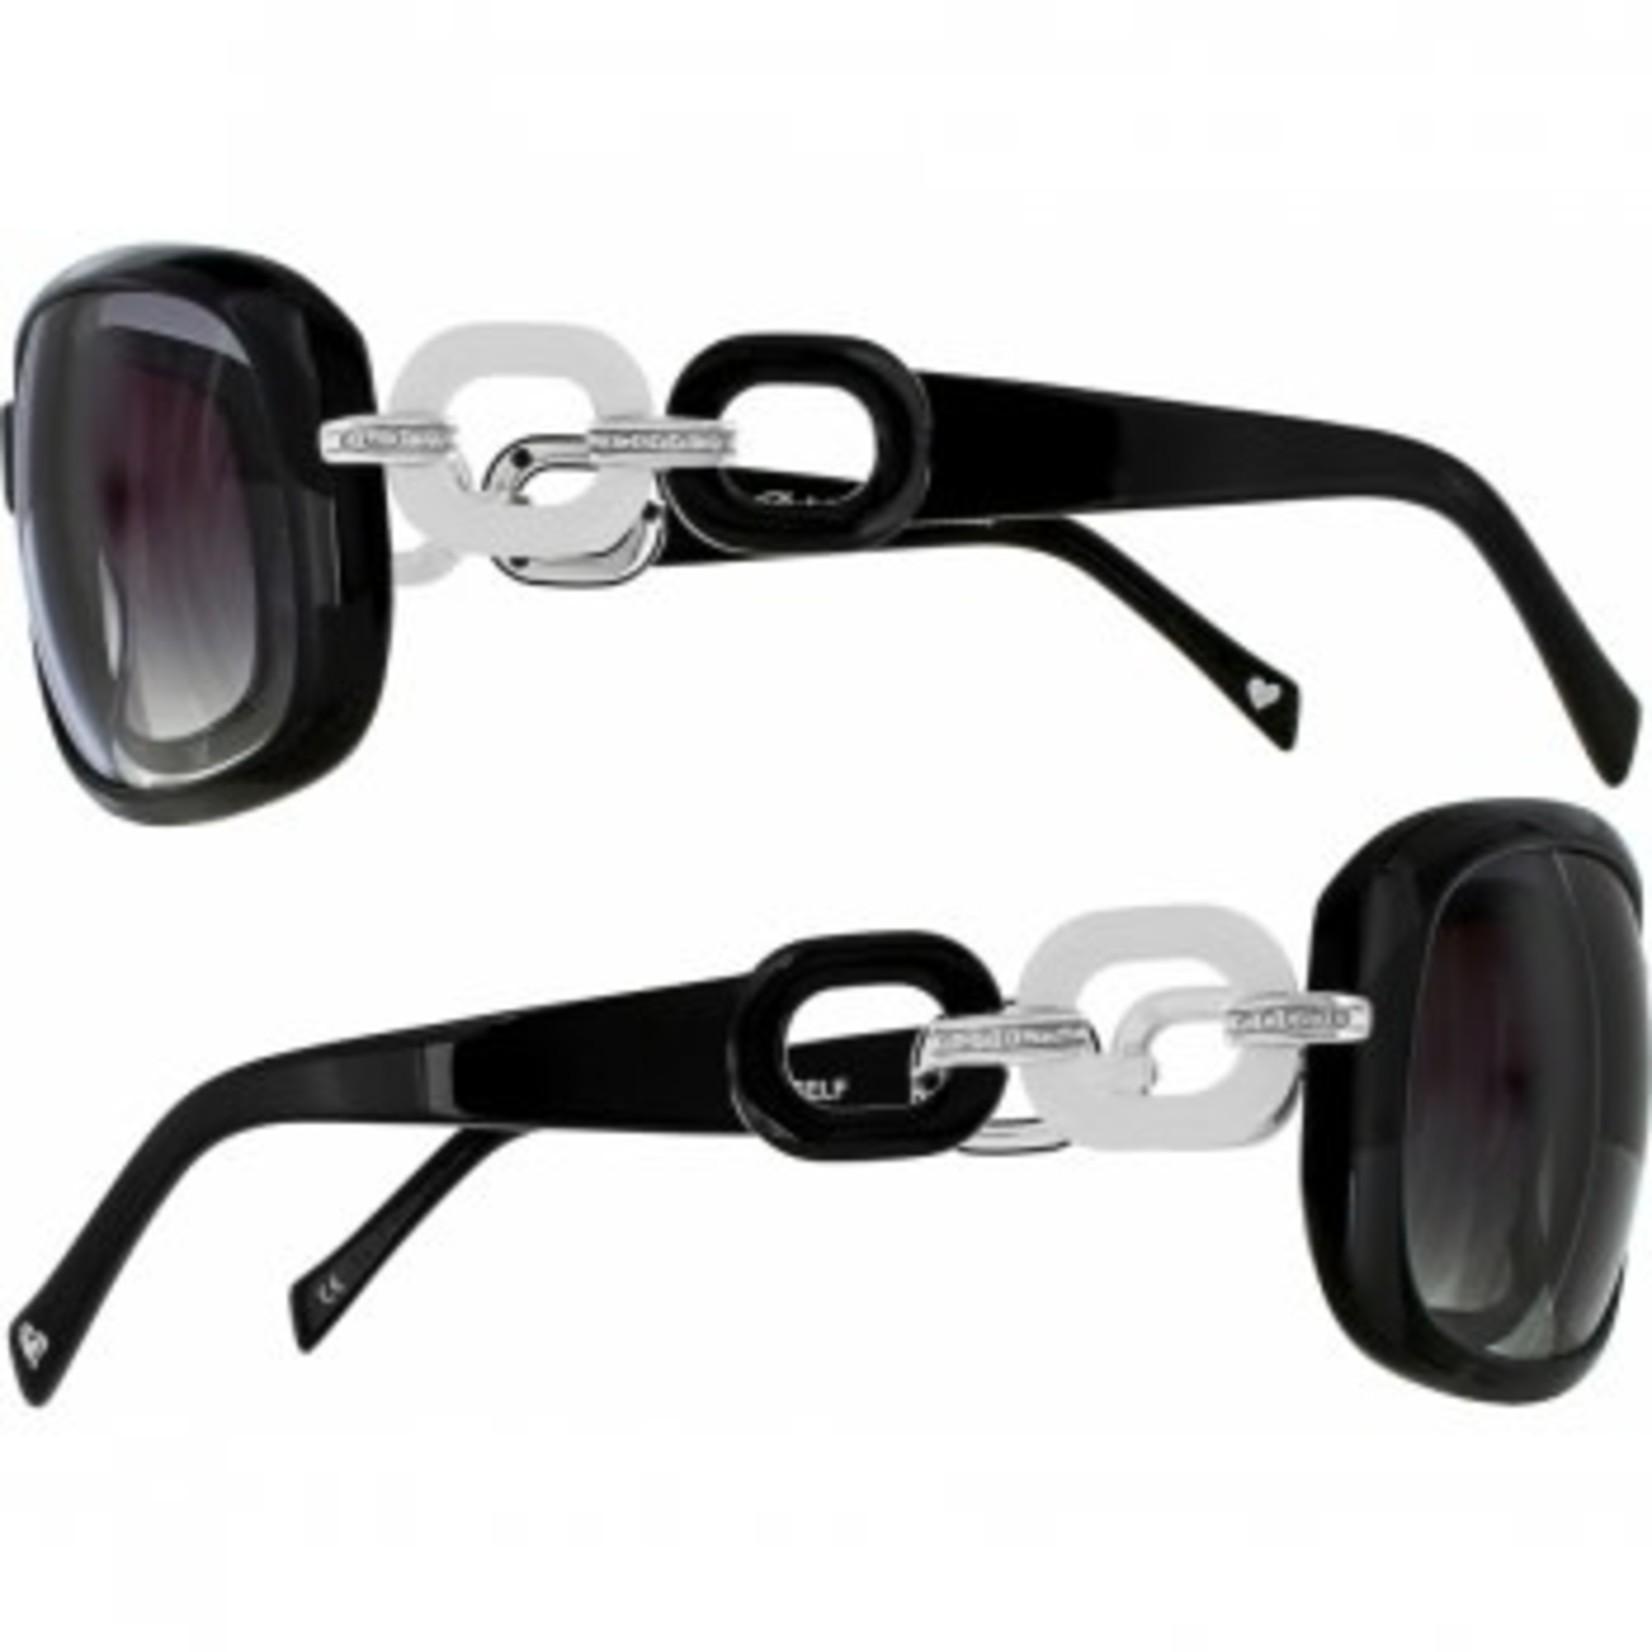 Brighton Express Yourself Sunglasses